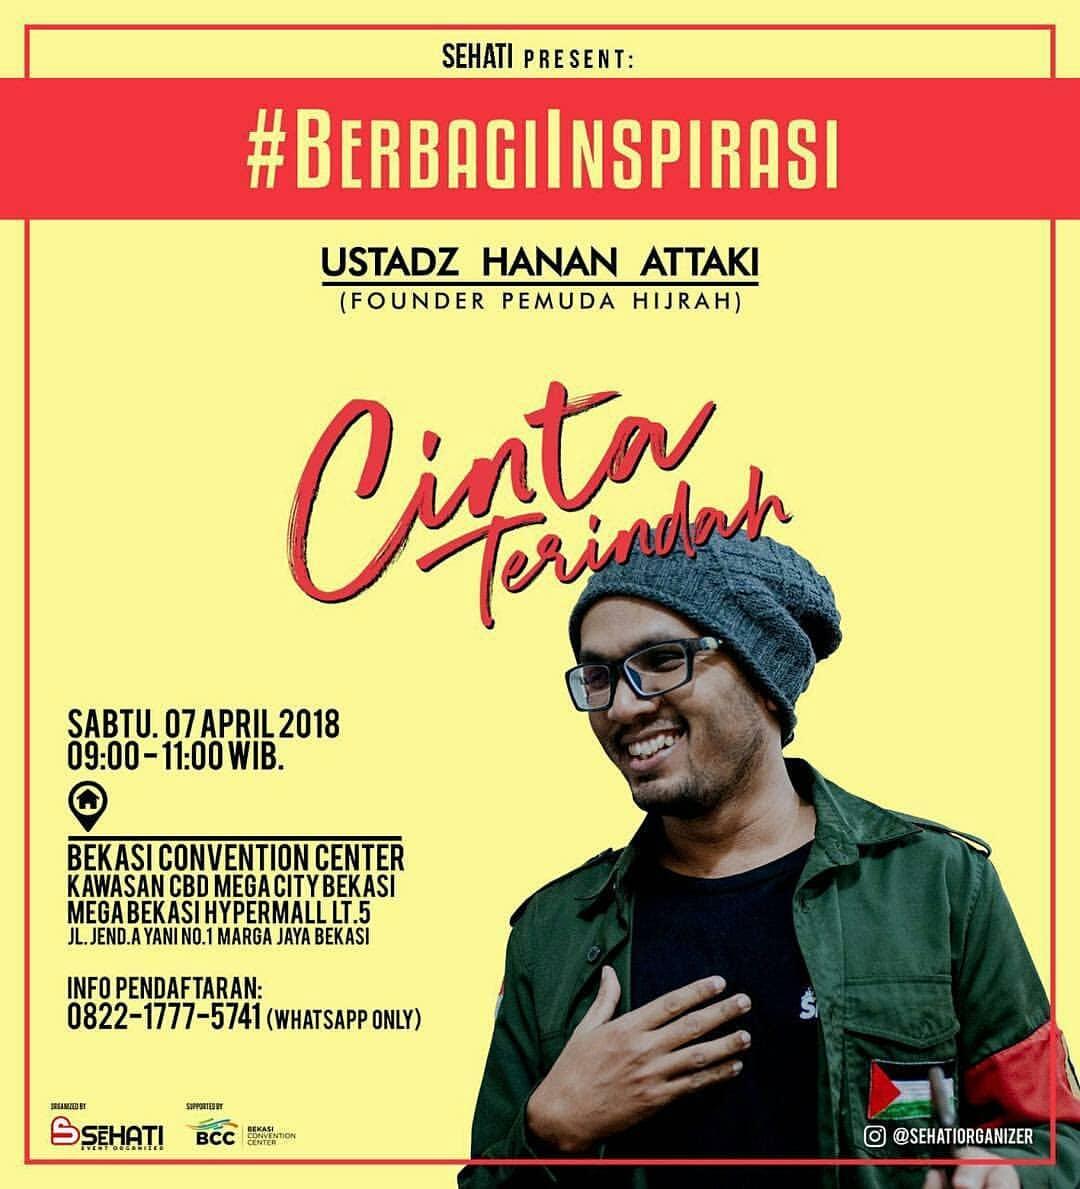 Ustadz Hanan Attaki Bekasi 7 April 2018